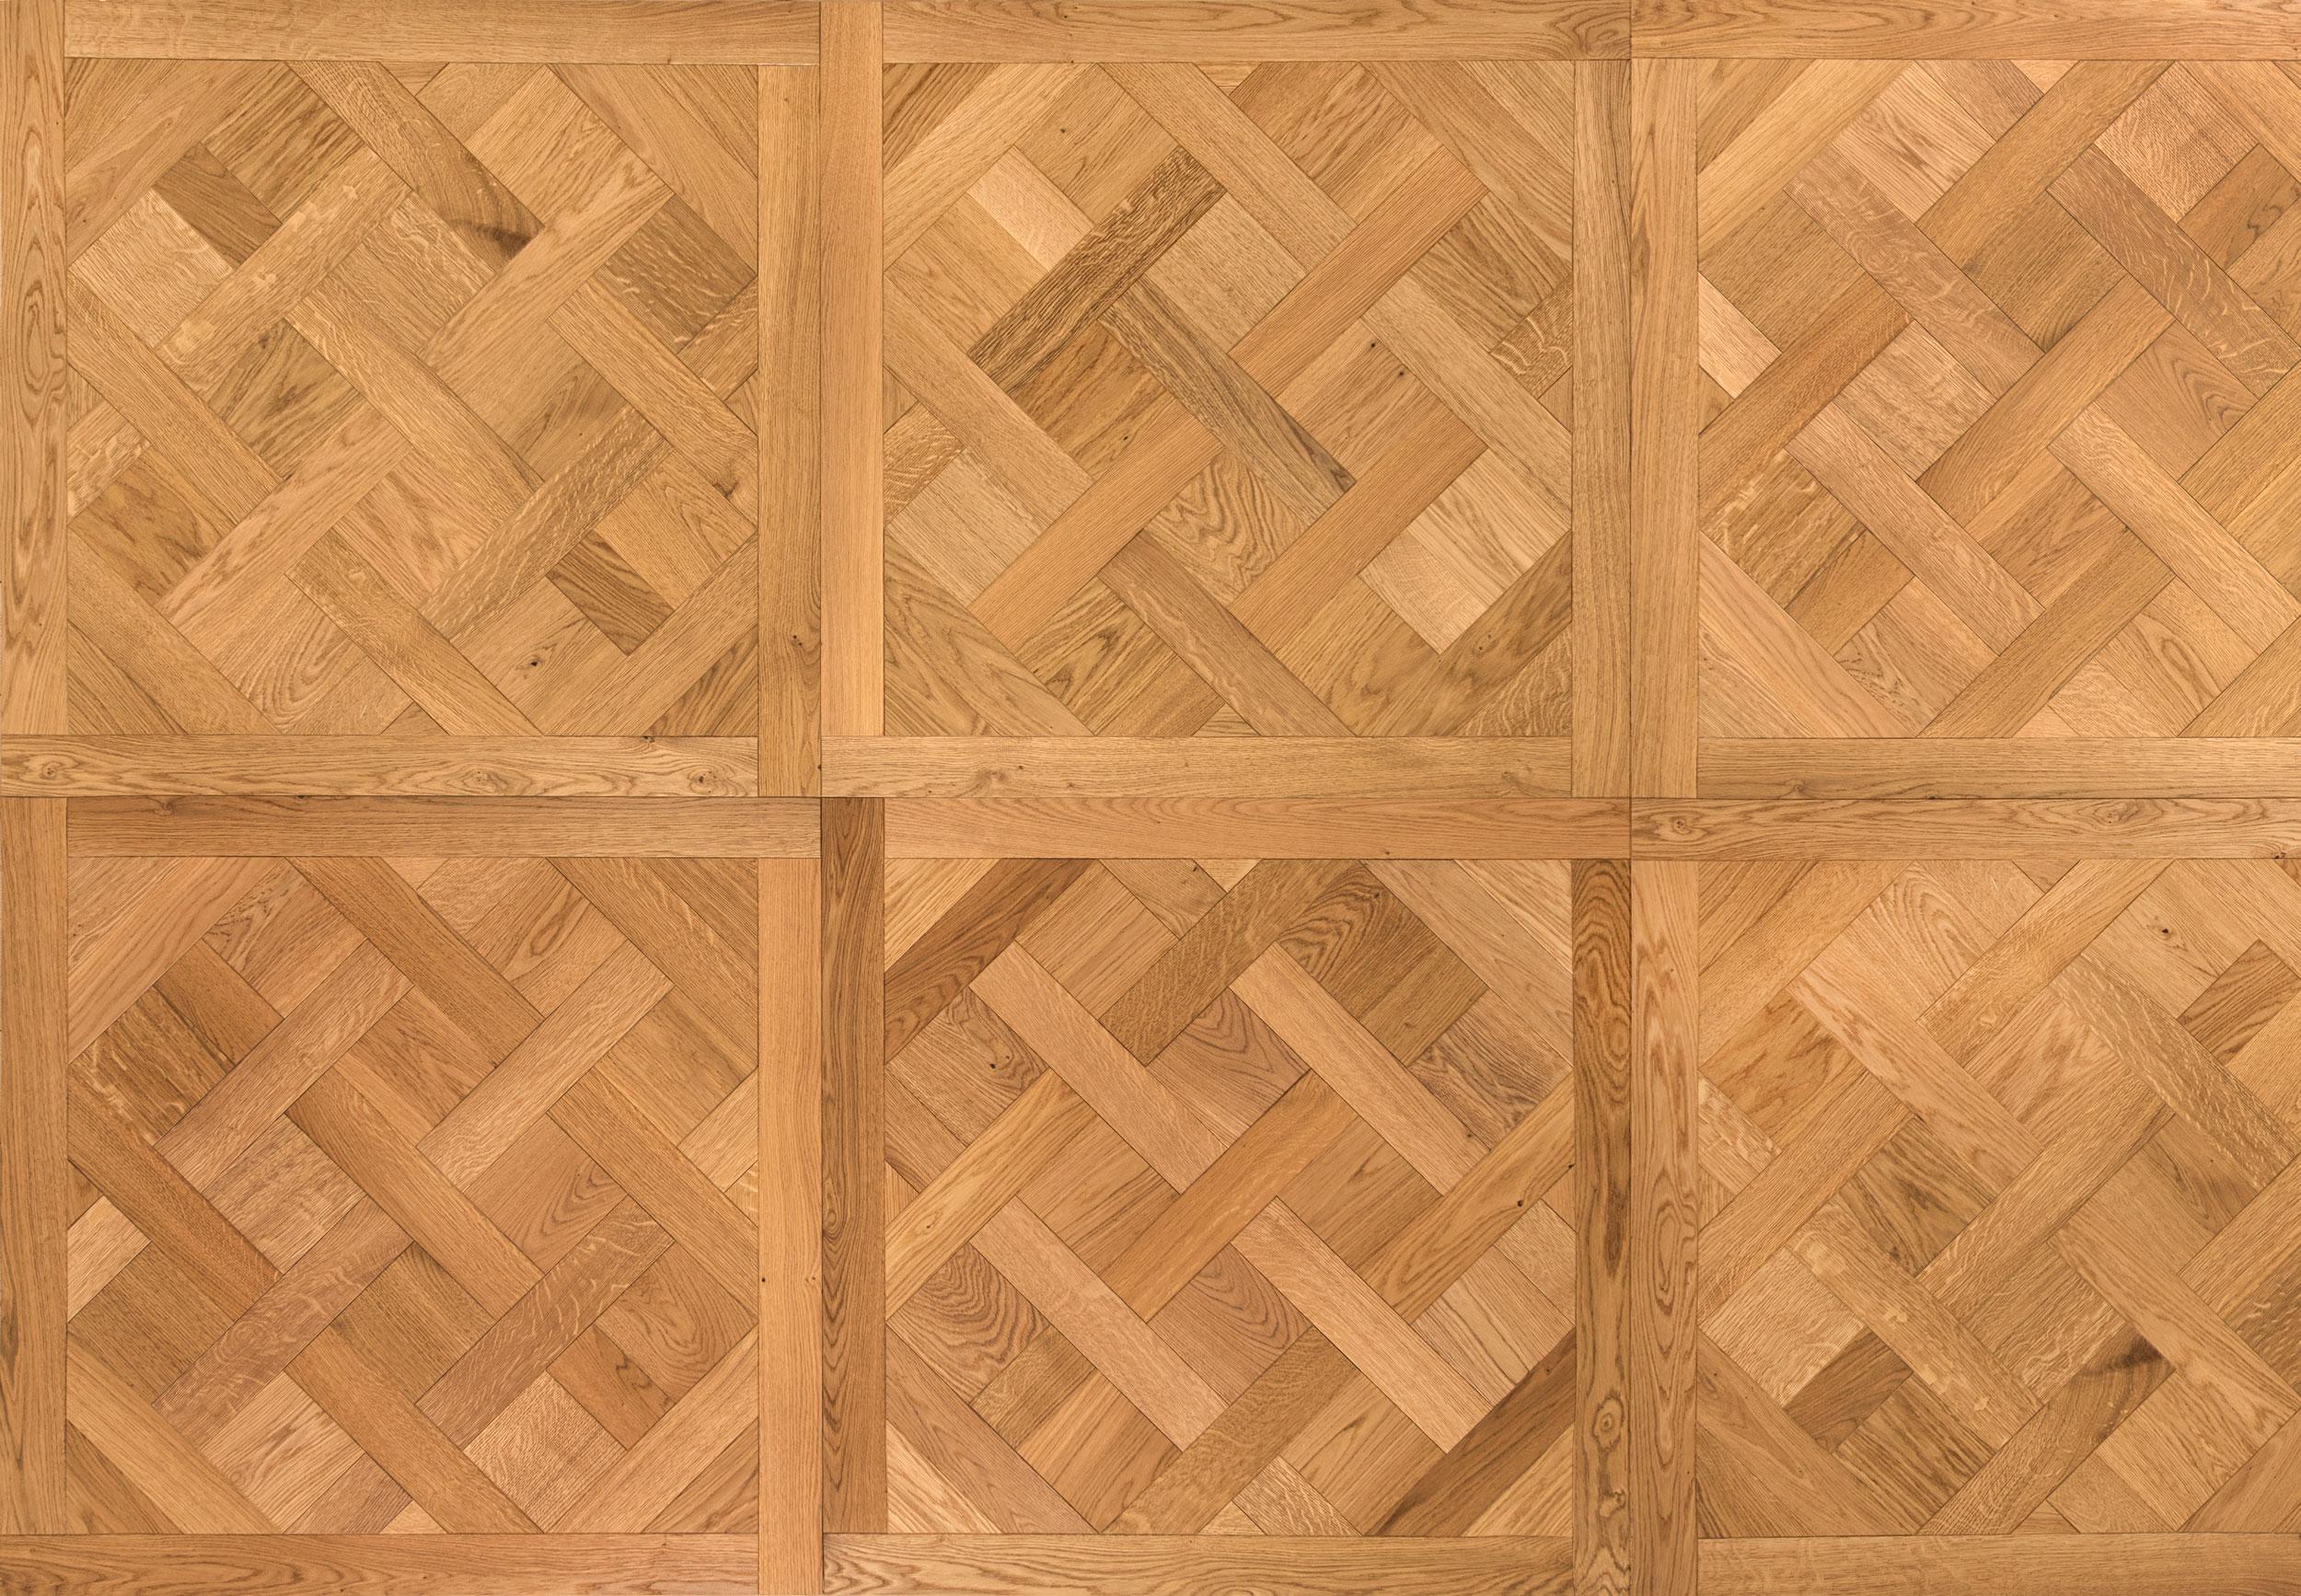 massivholzboden online kaufen parkett agentur. Black Bedroom Furniture Sets. Home Design Ideas